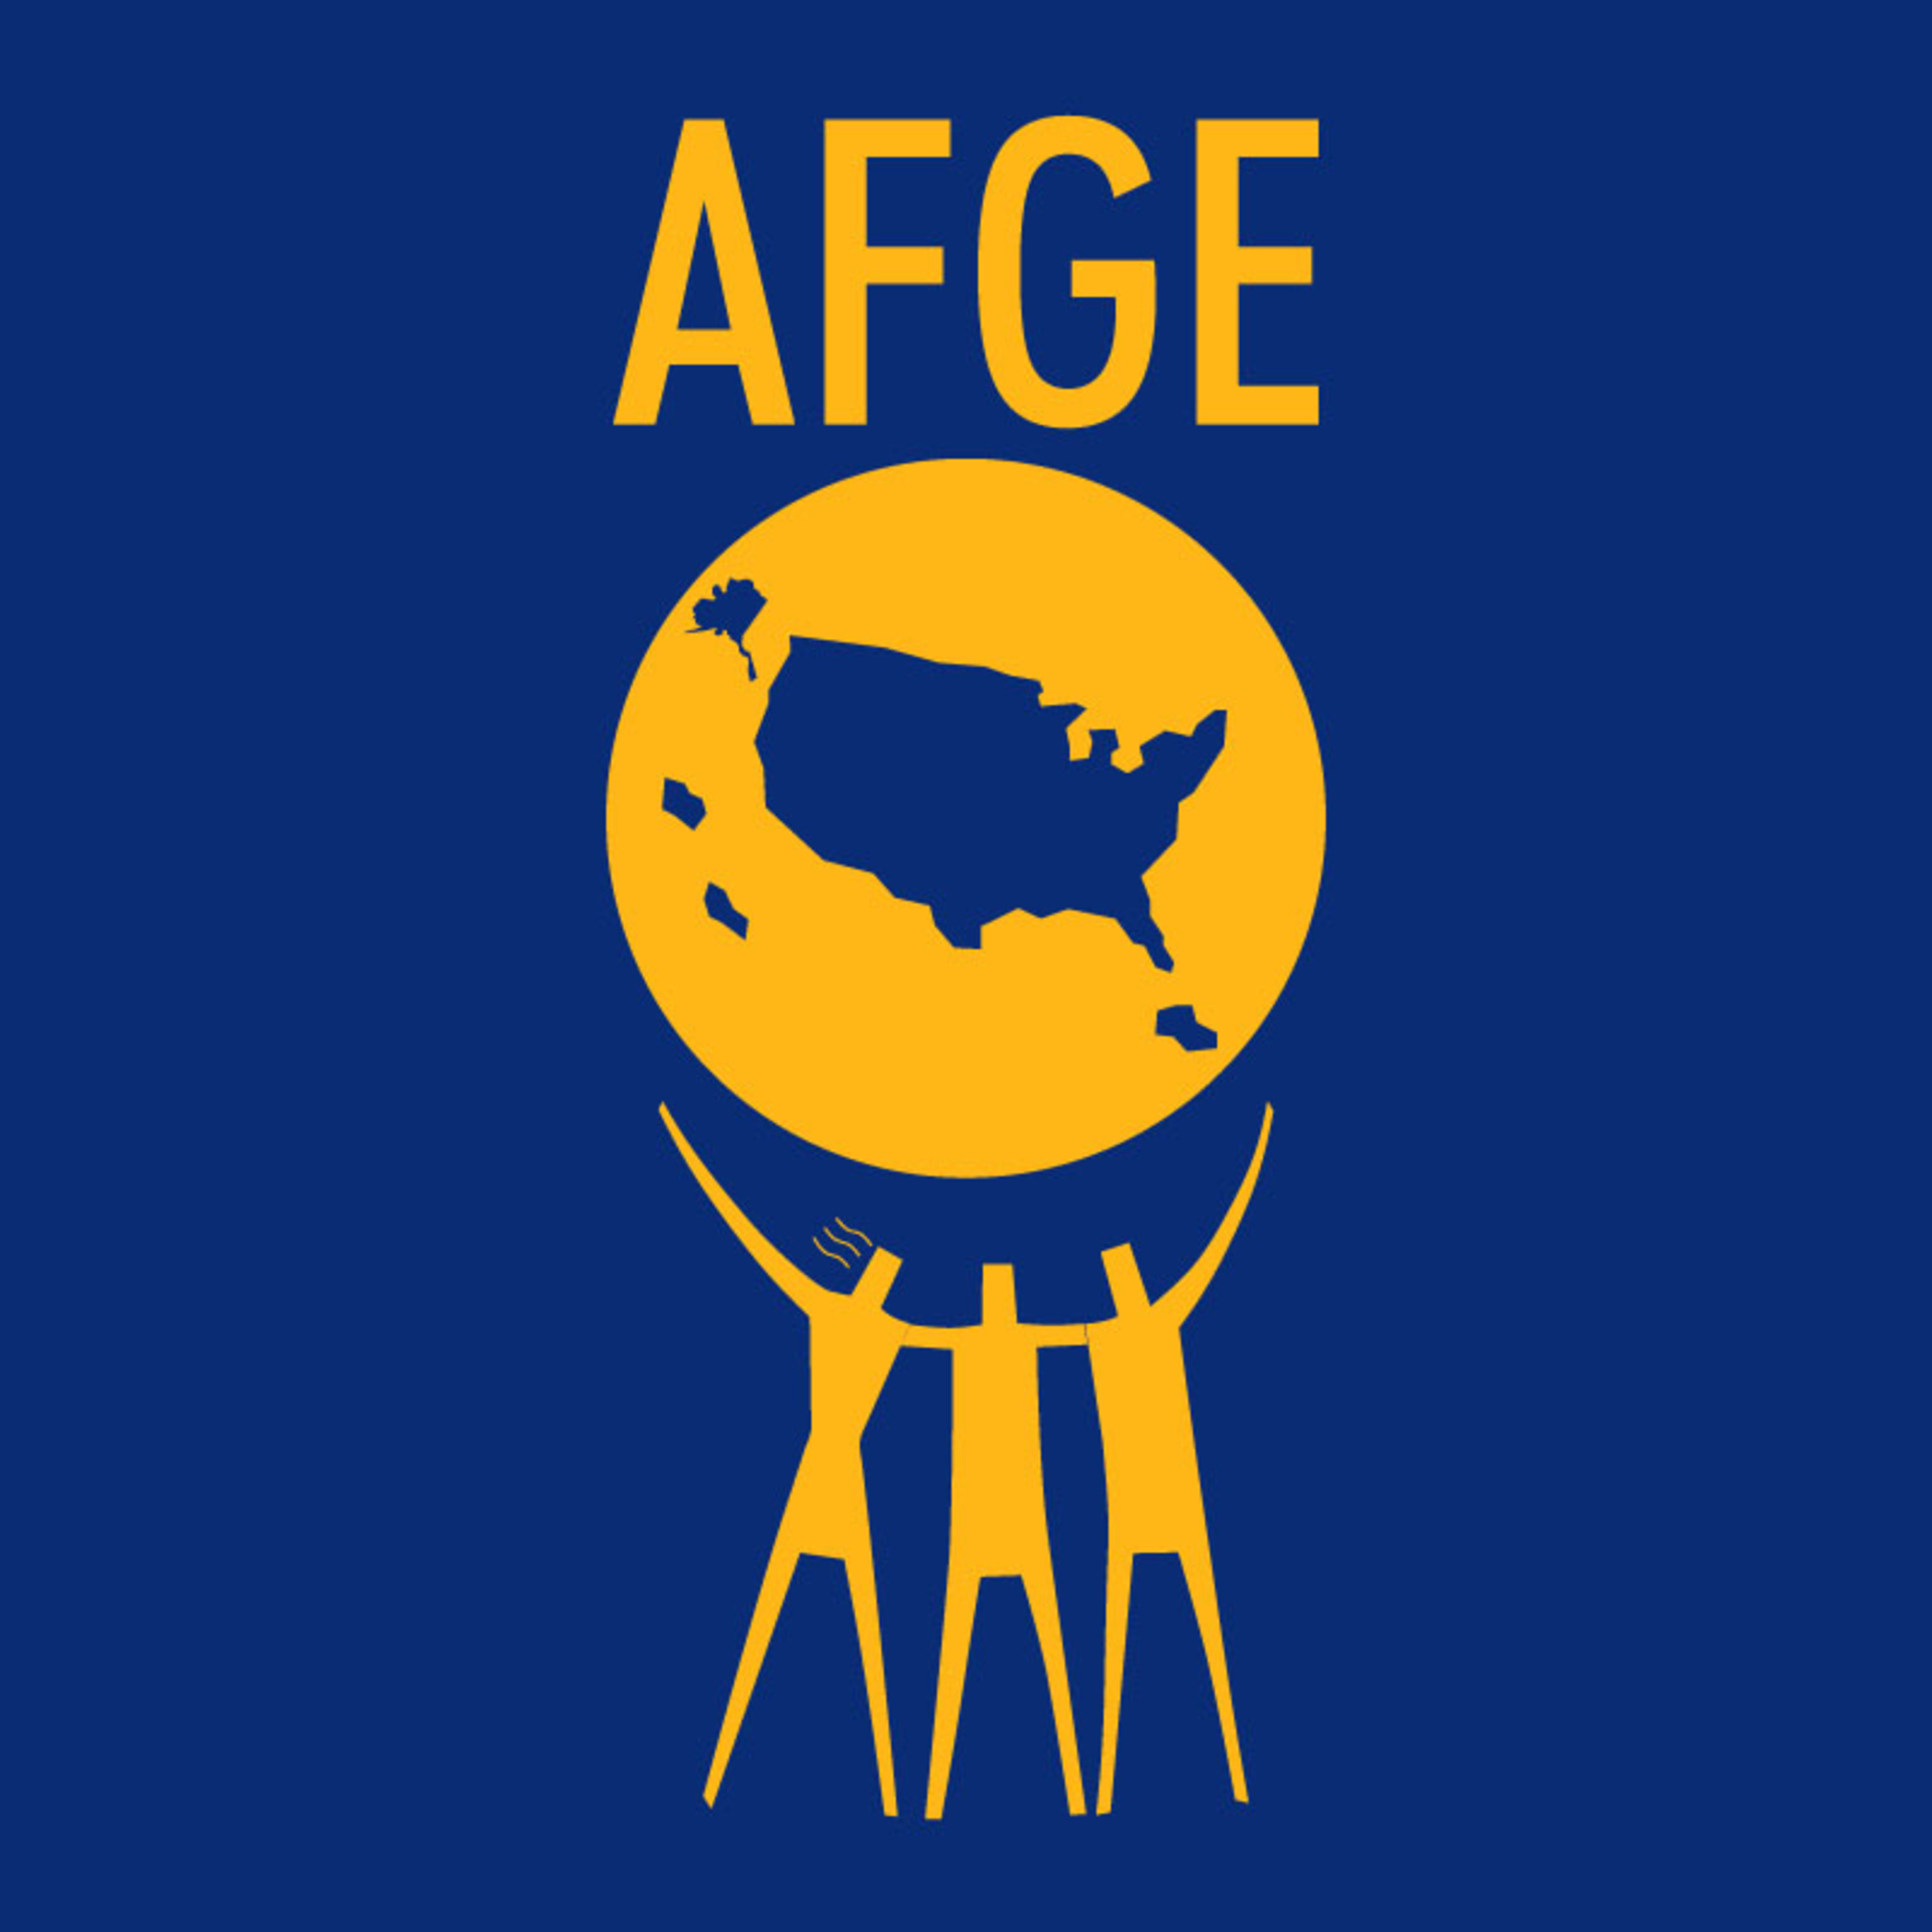 AFGE logo